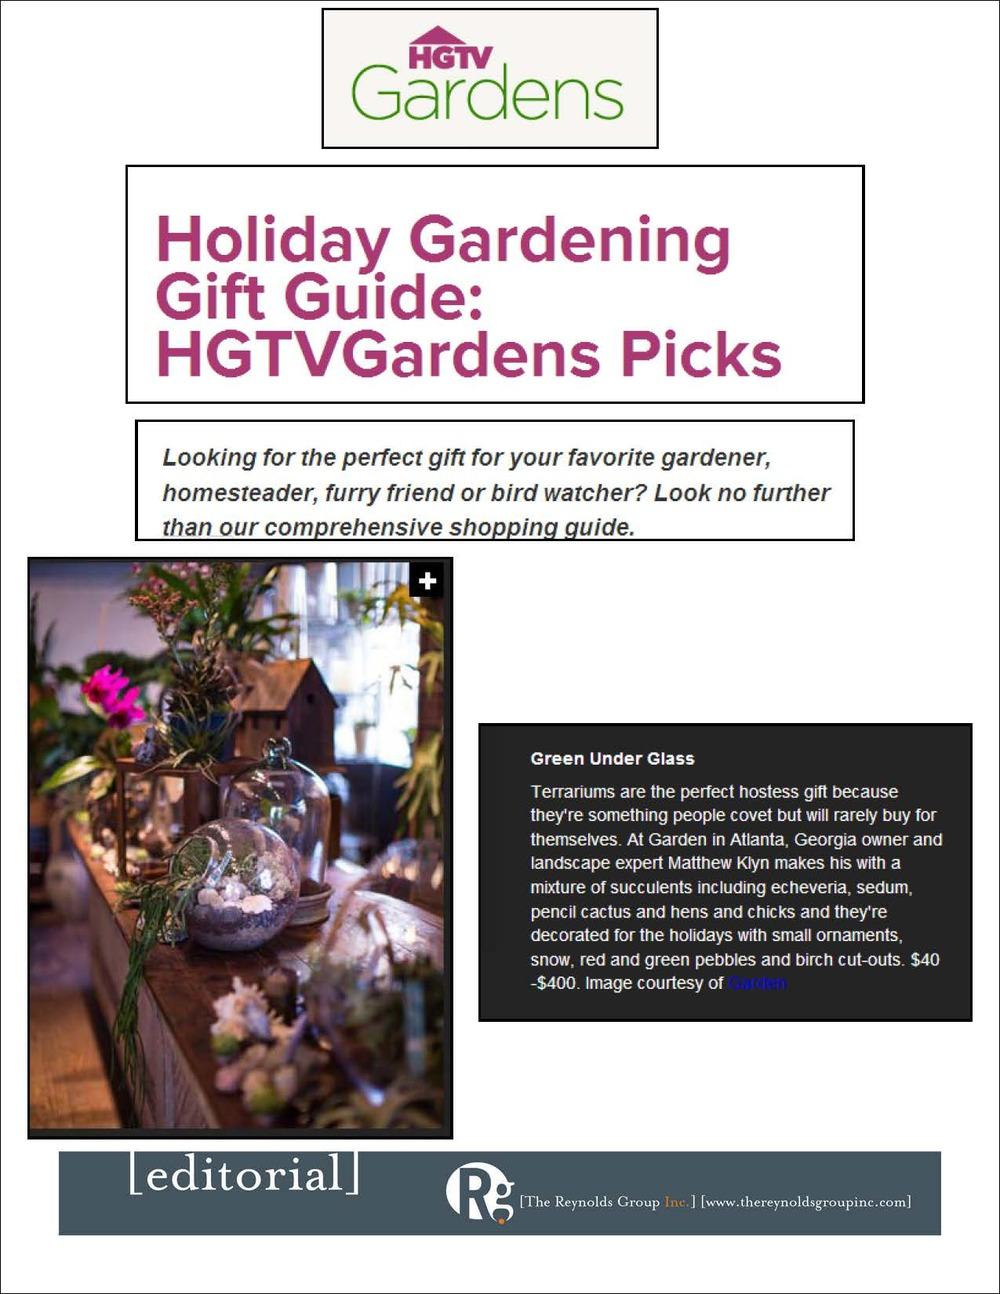 12.11.12.Garden.HGTVGardens.jpg